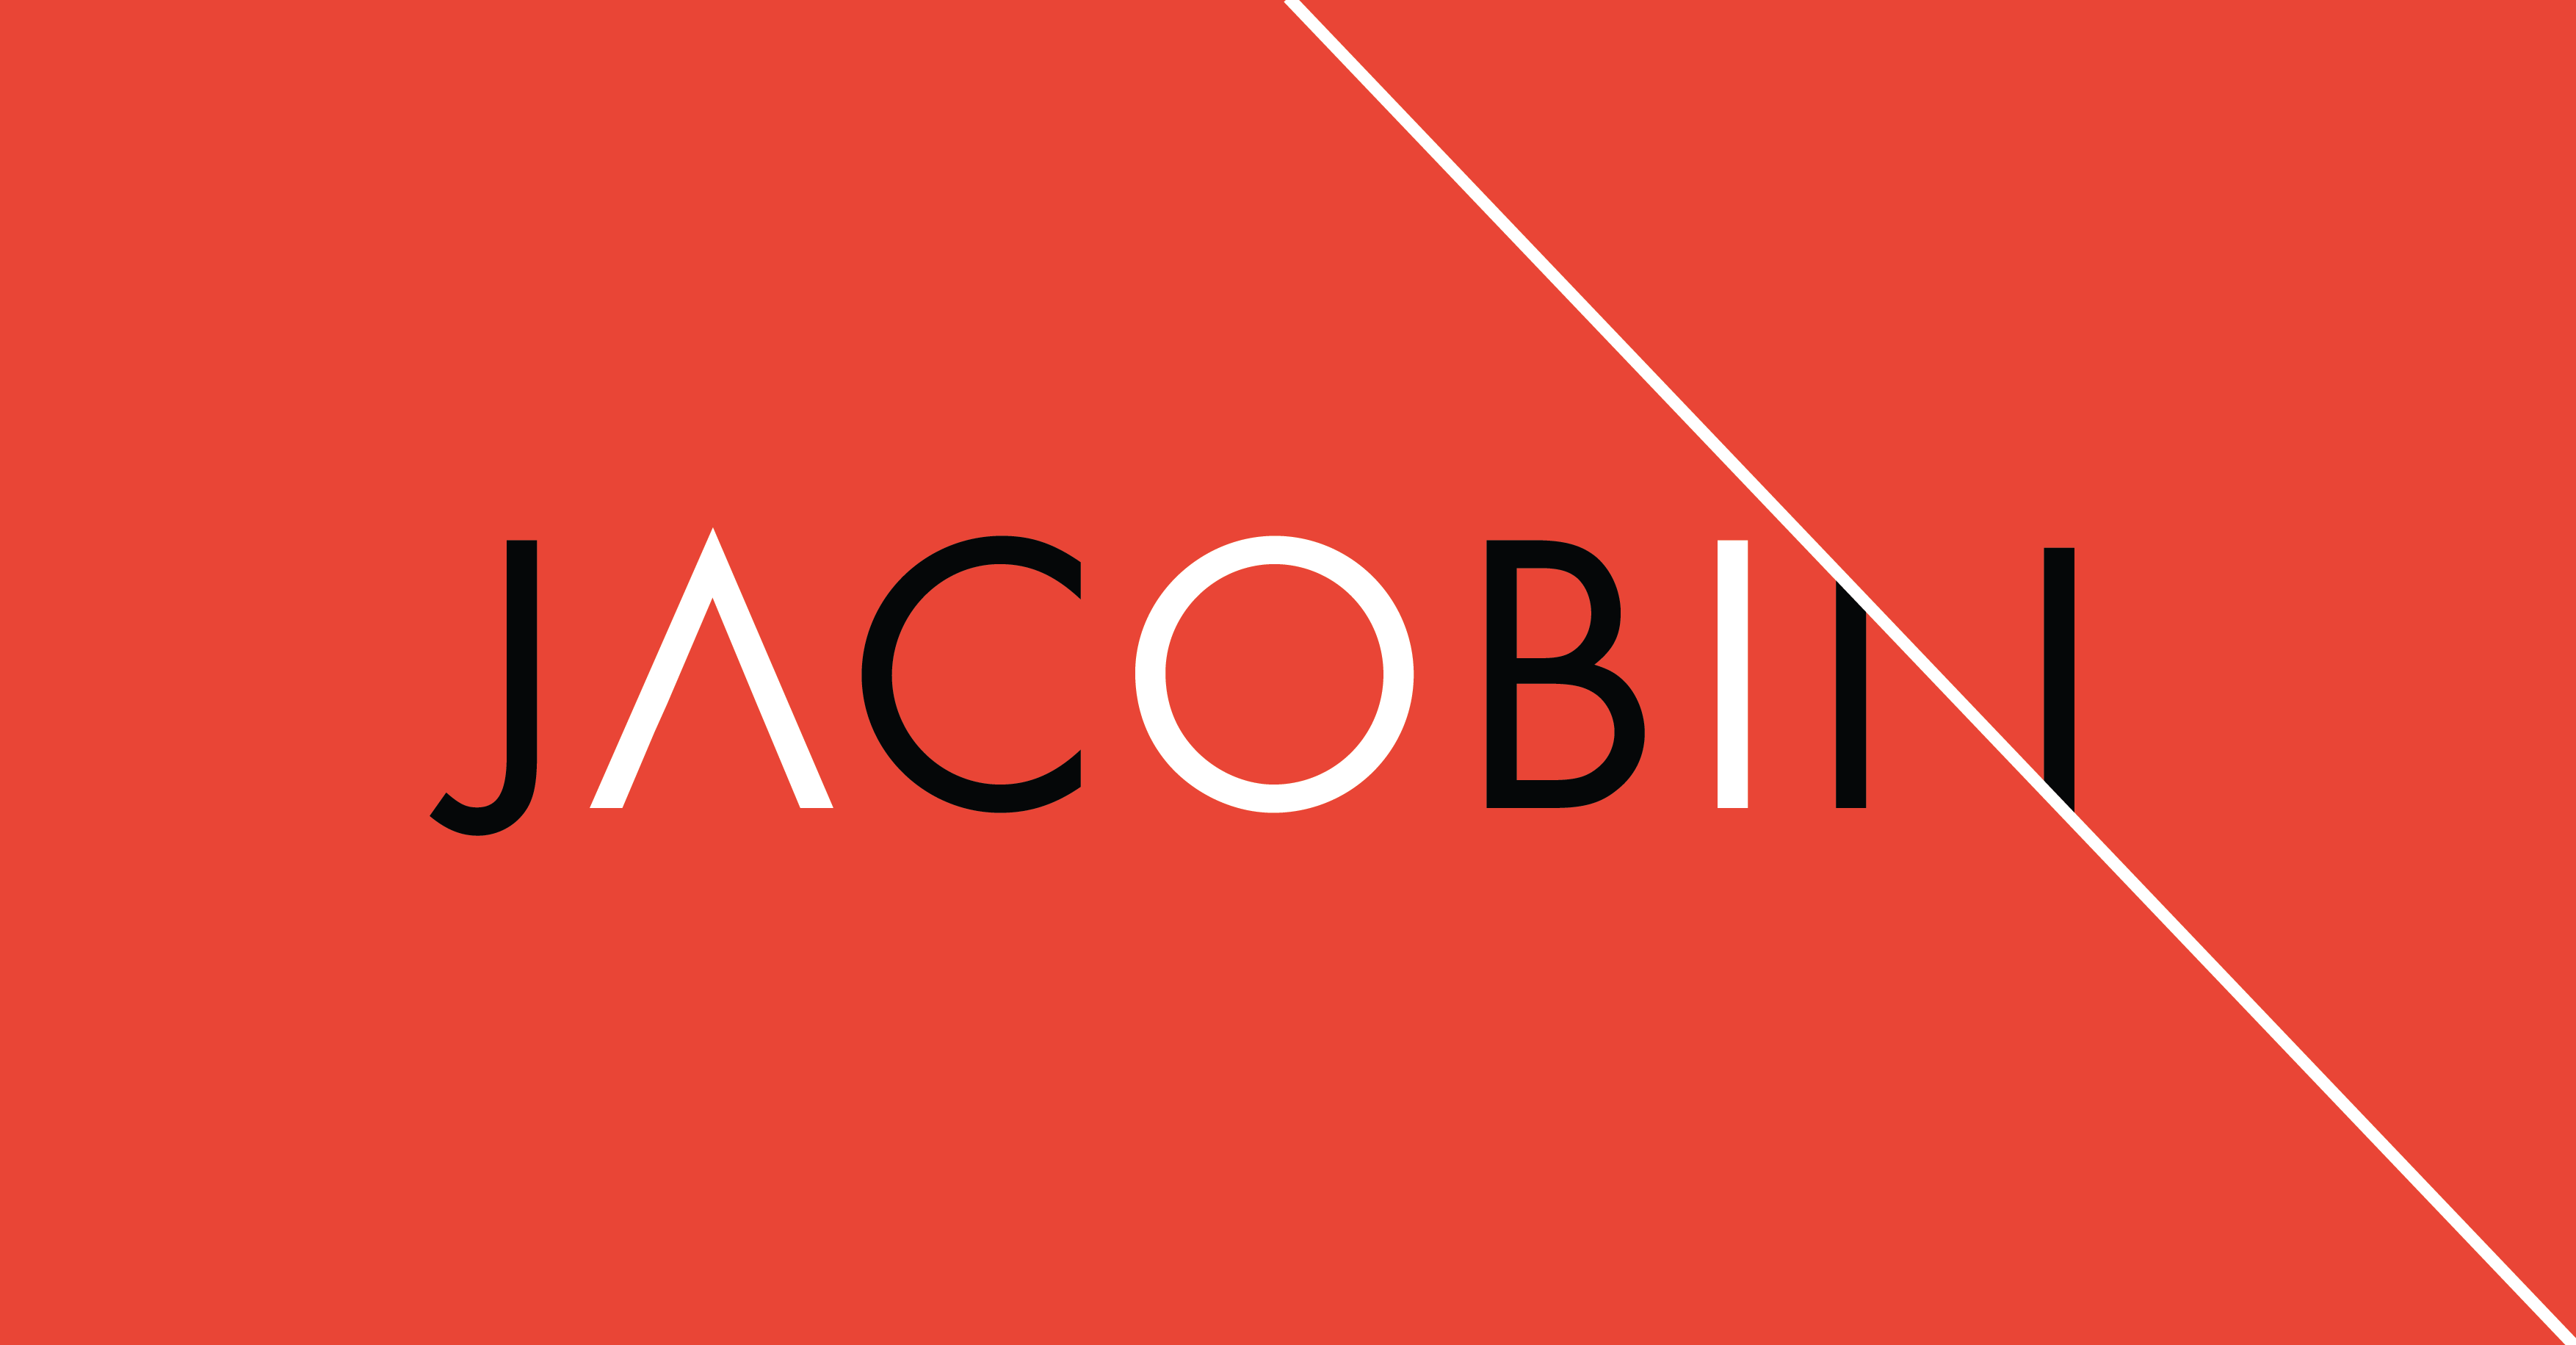 Inside Jacobin: how a socialist magazine is winning the left's war of ideas - Vox